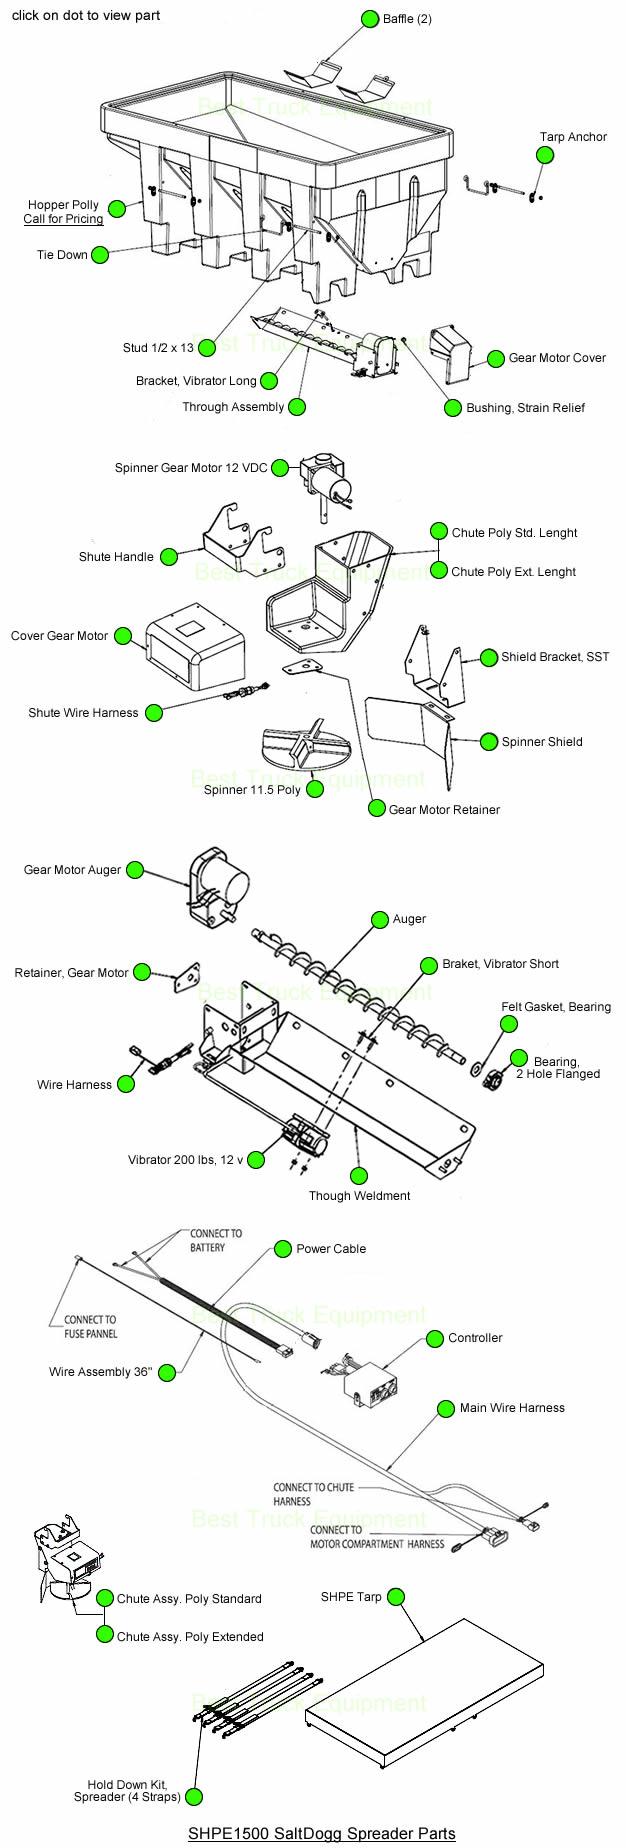 Kohler Engine Wiring Diagrams Ch20s Diagram